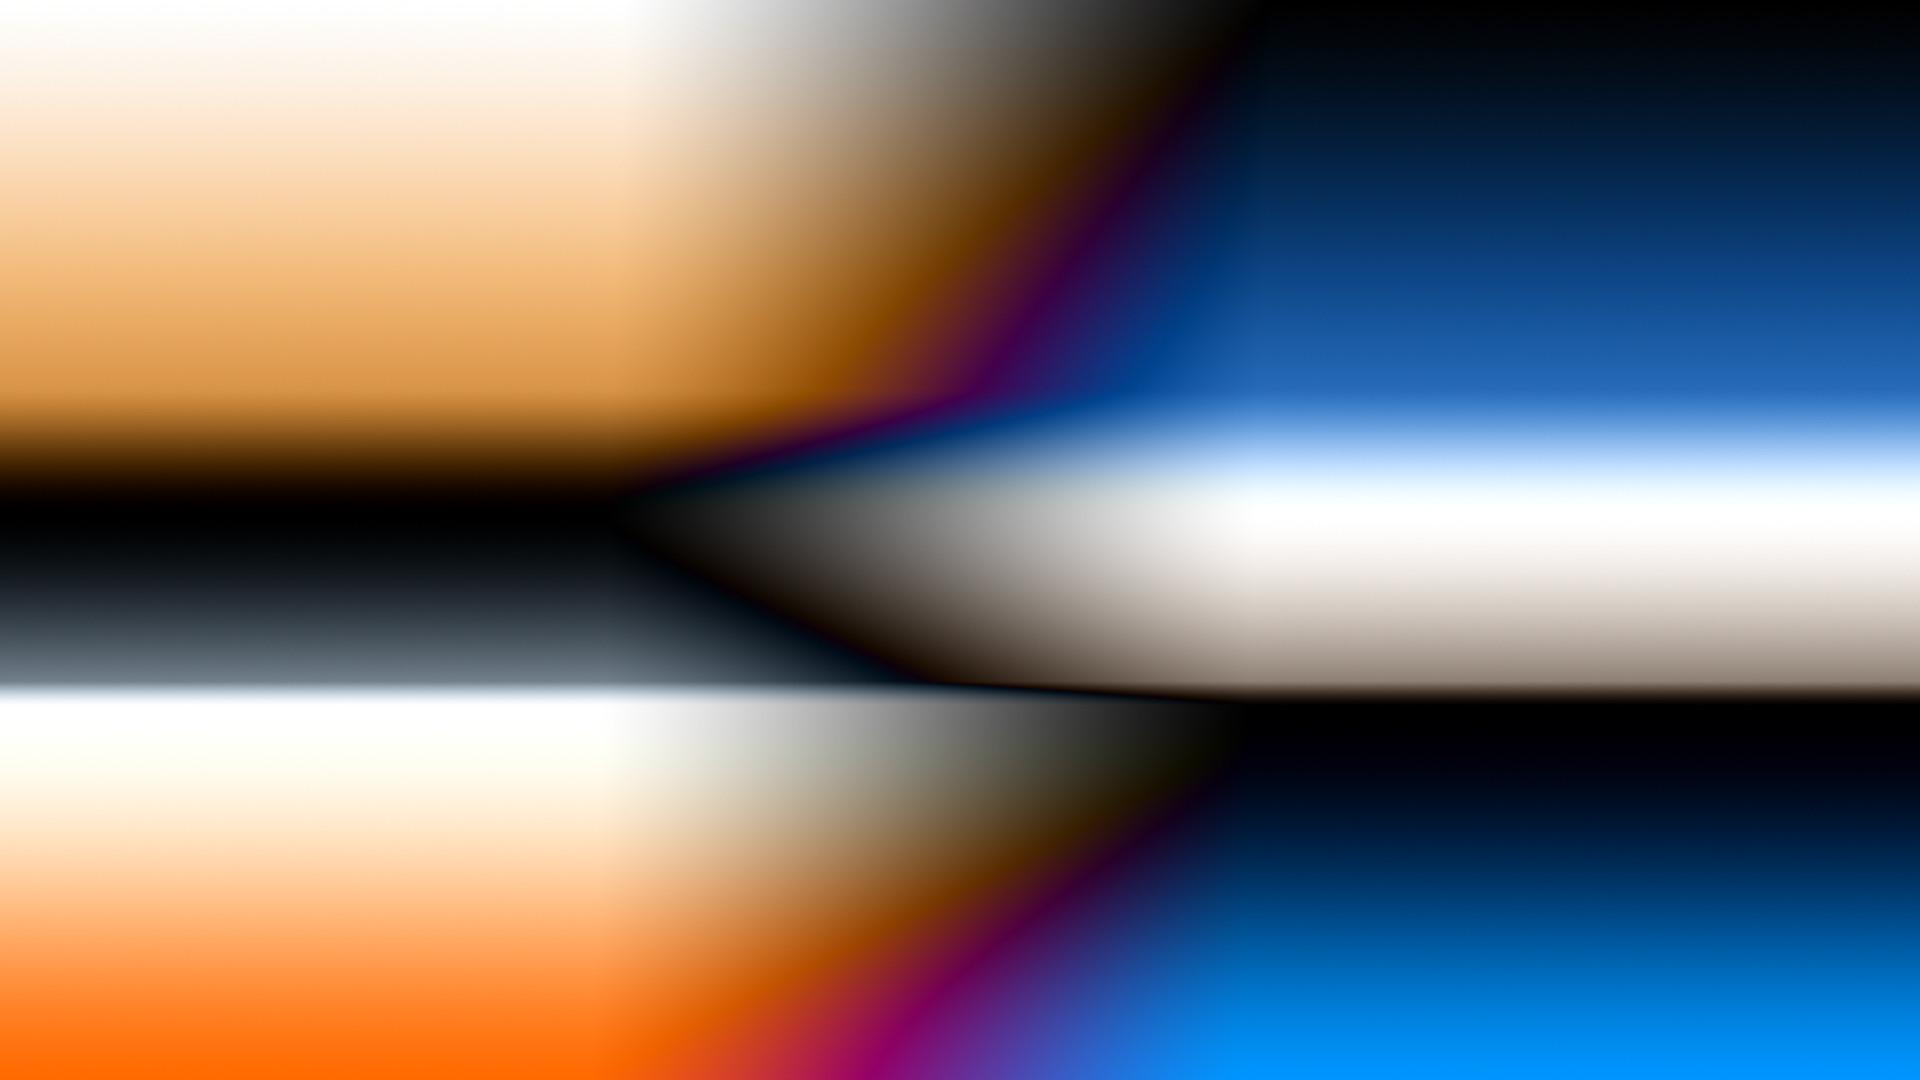 gold-pink-blue-white-black-gradient-desktop-wallpaper-